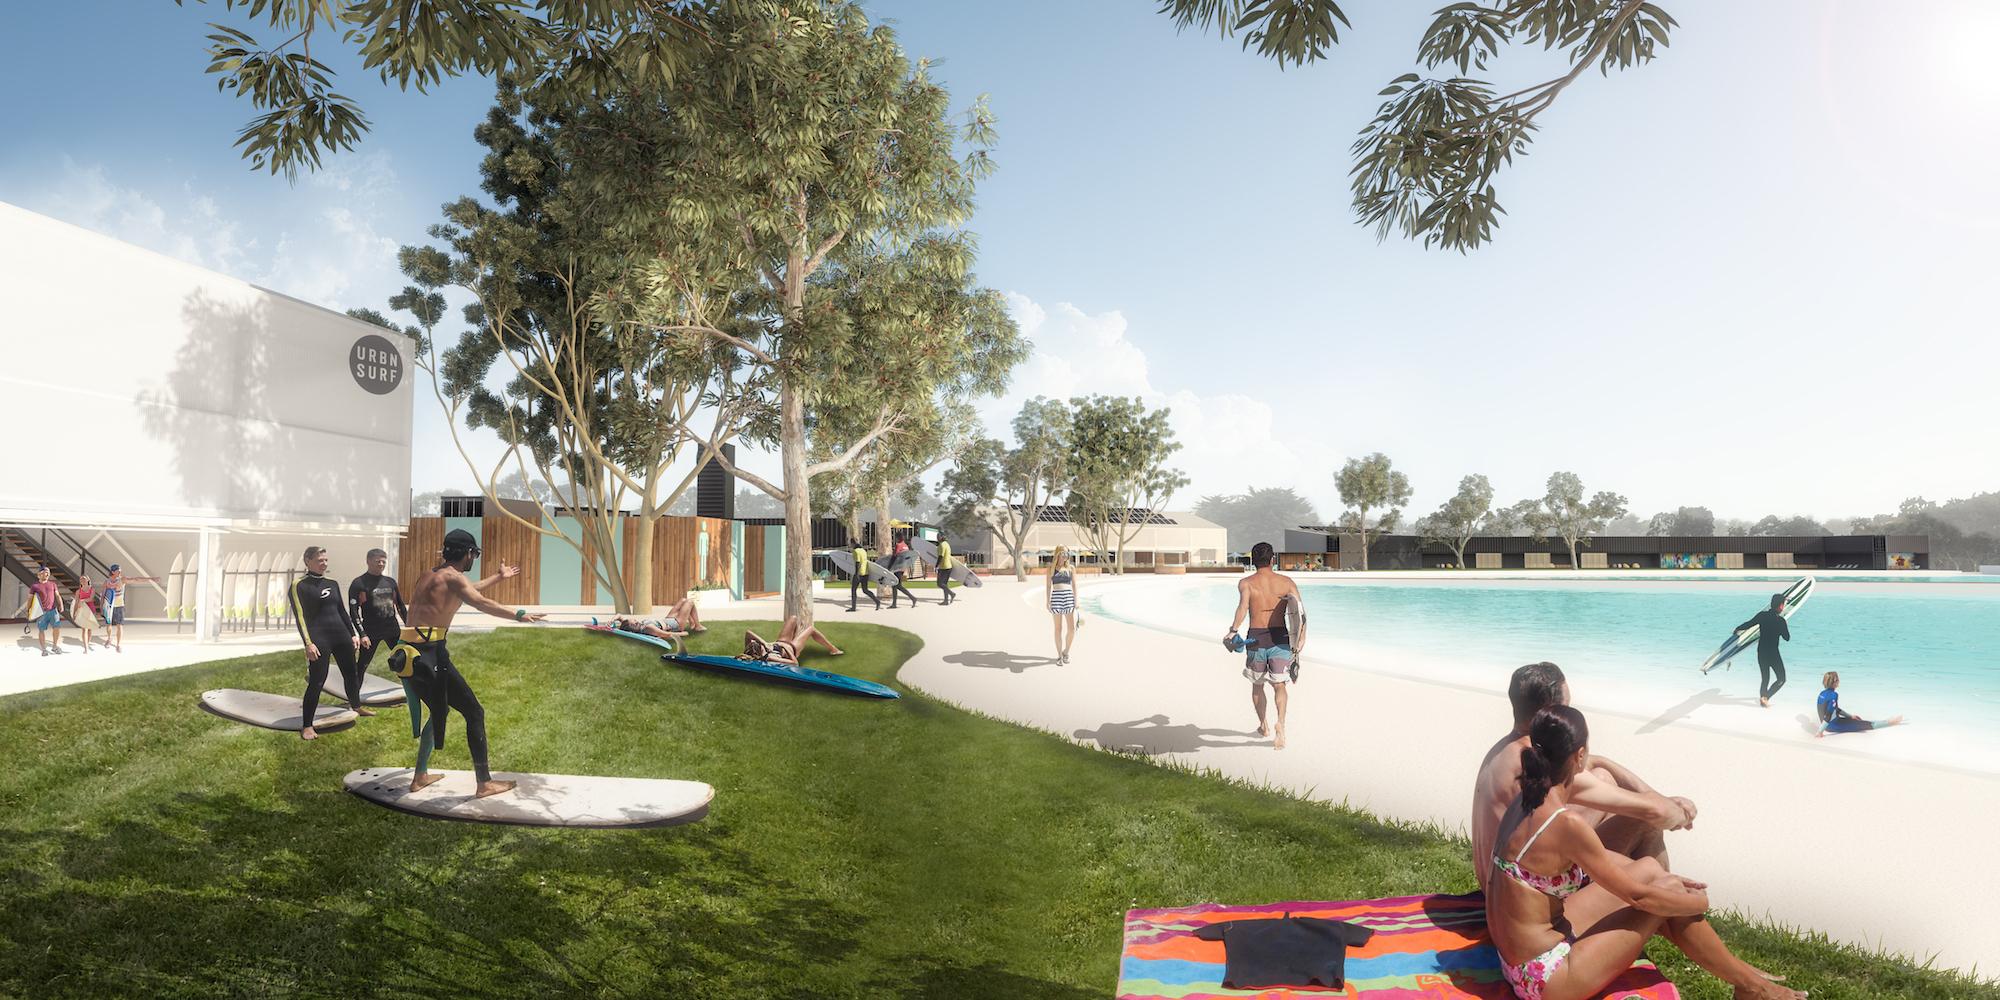 inland surf park Melbourne